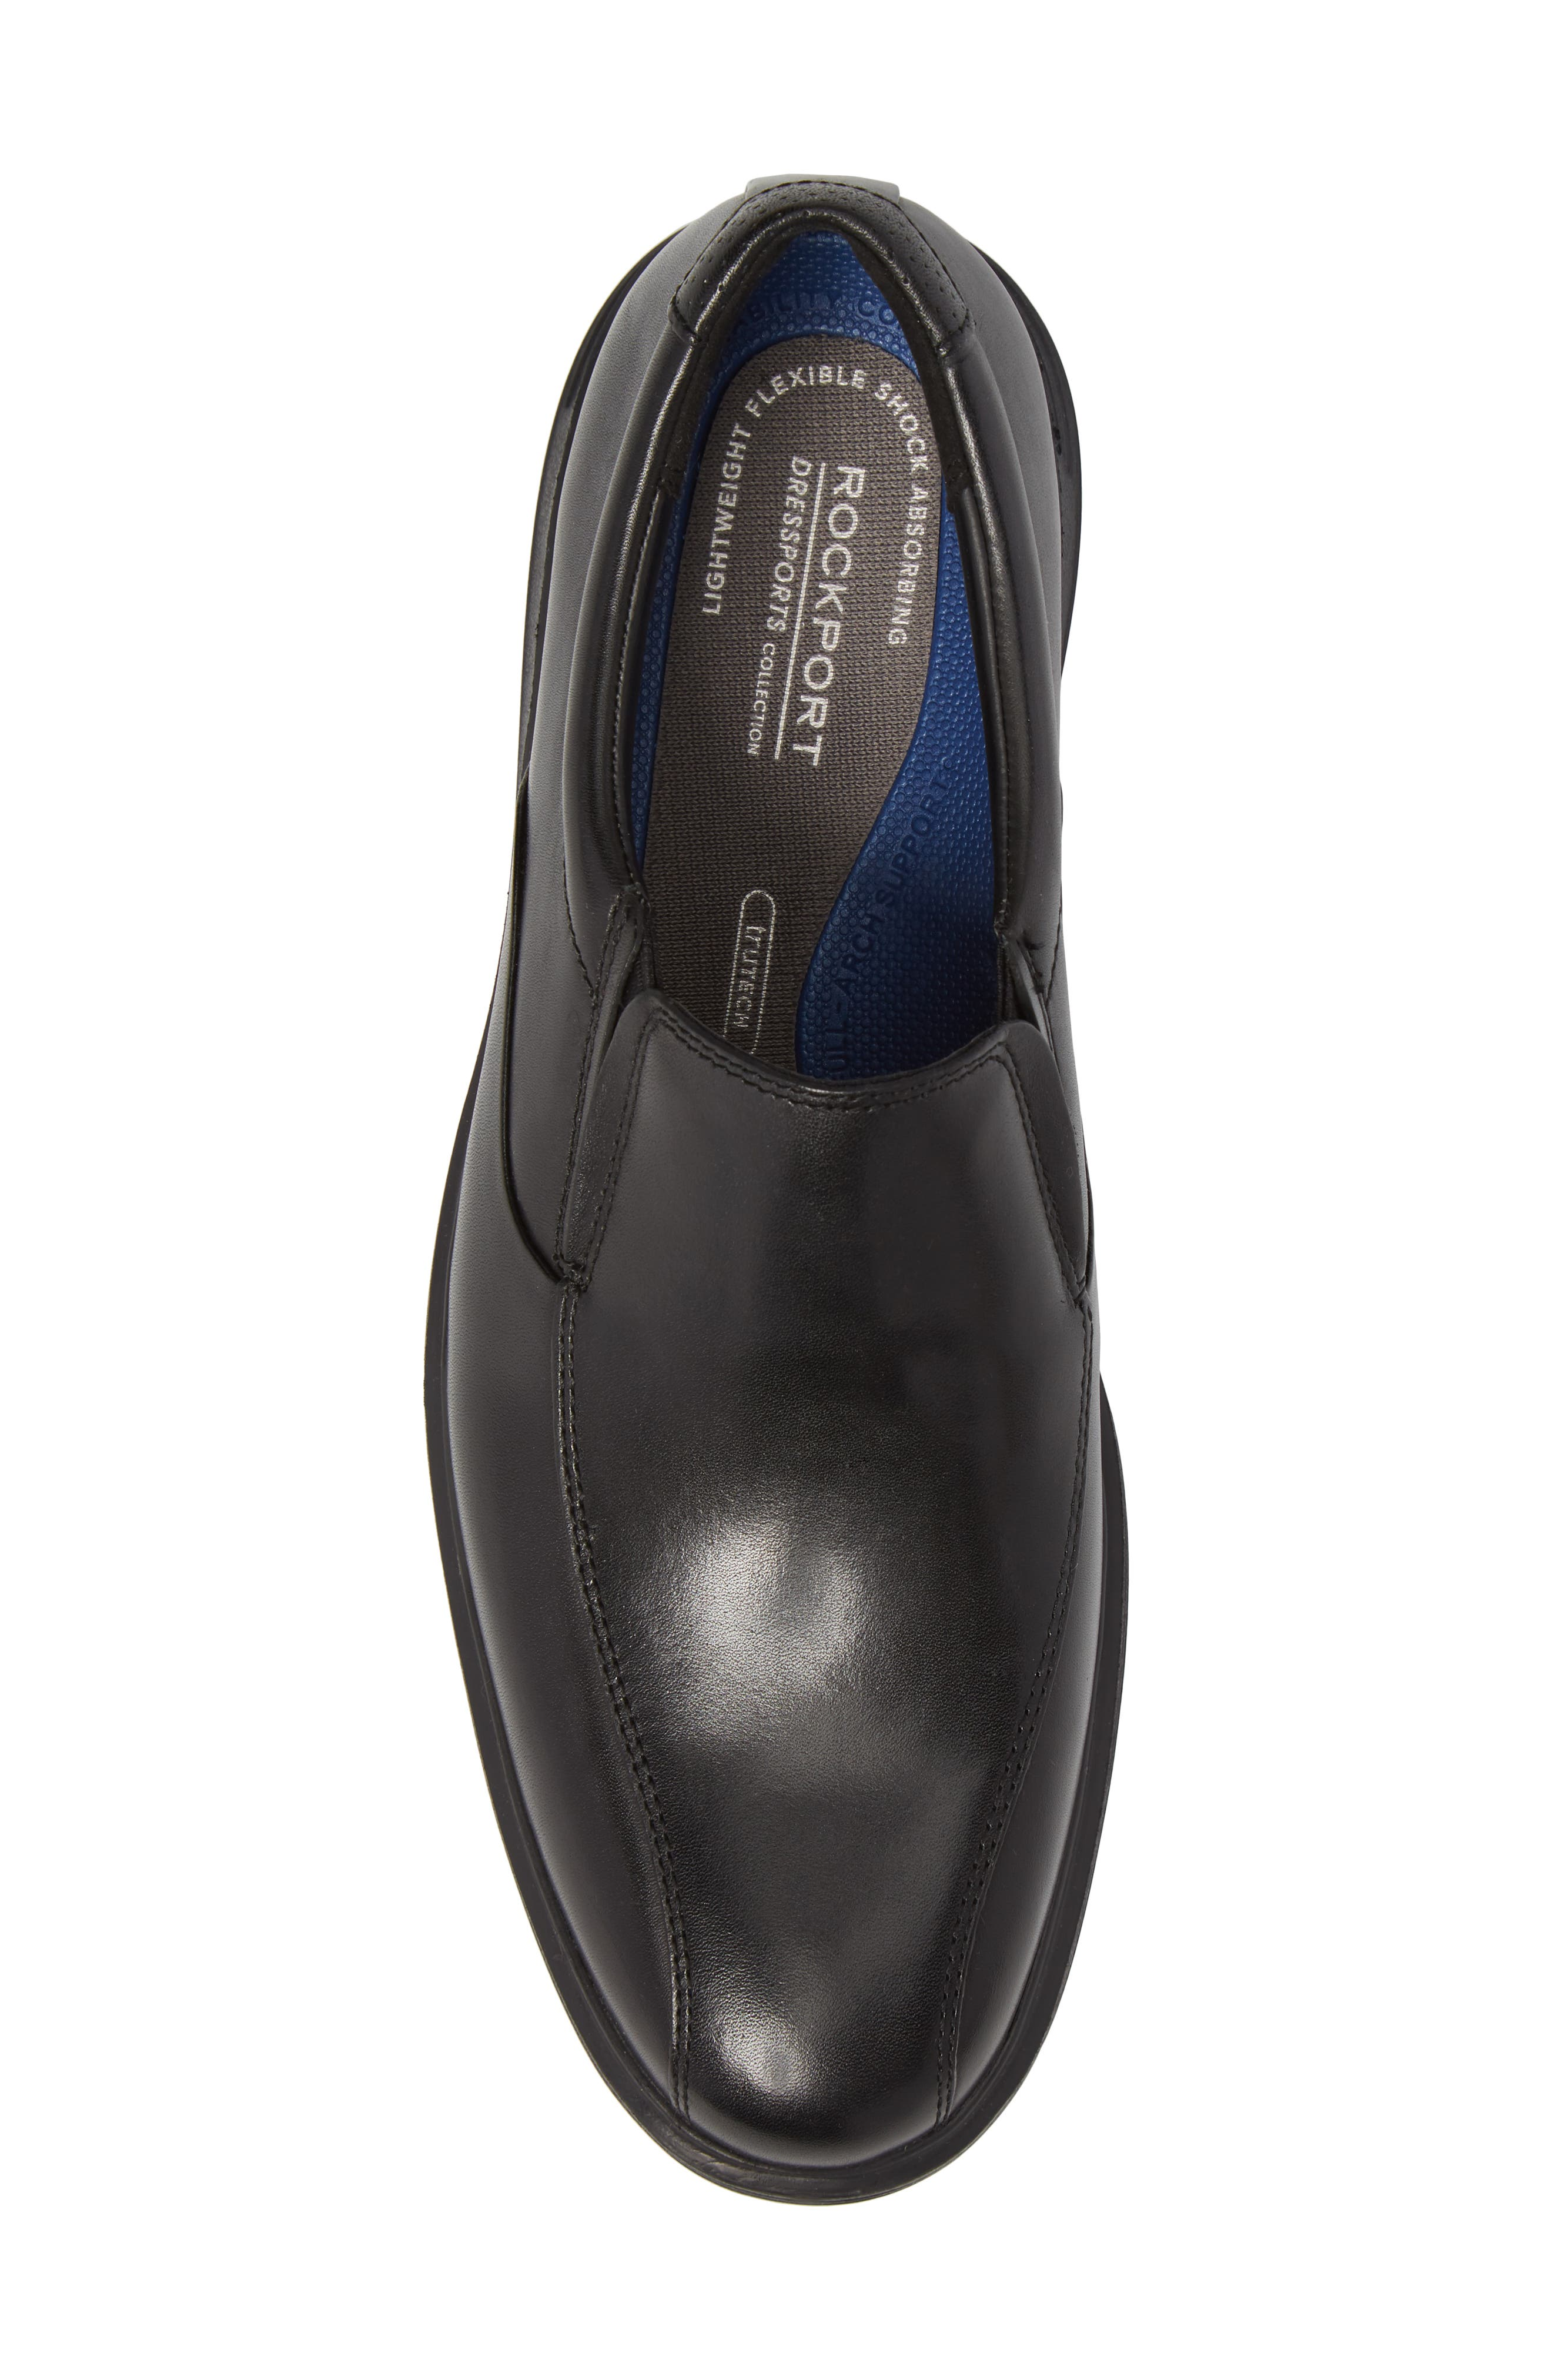 Dressports 2 Lite Venetian Loafer,                             Alternate thumbnail 5, color,                             Black Leather